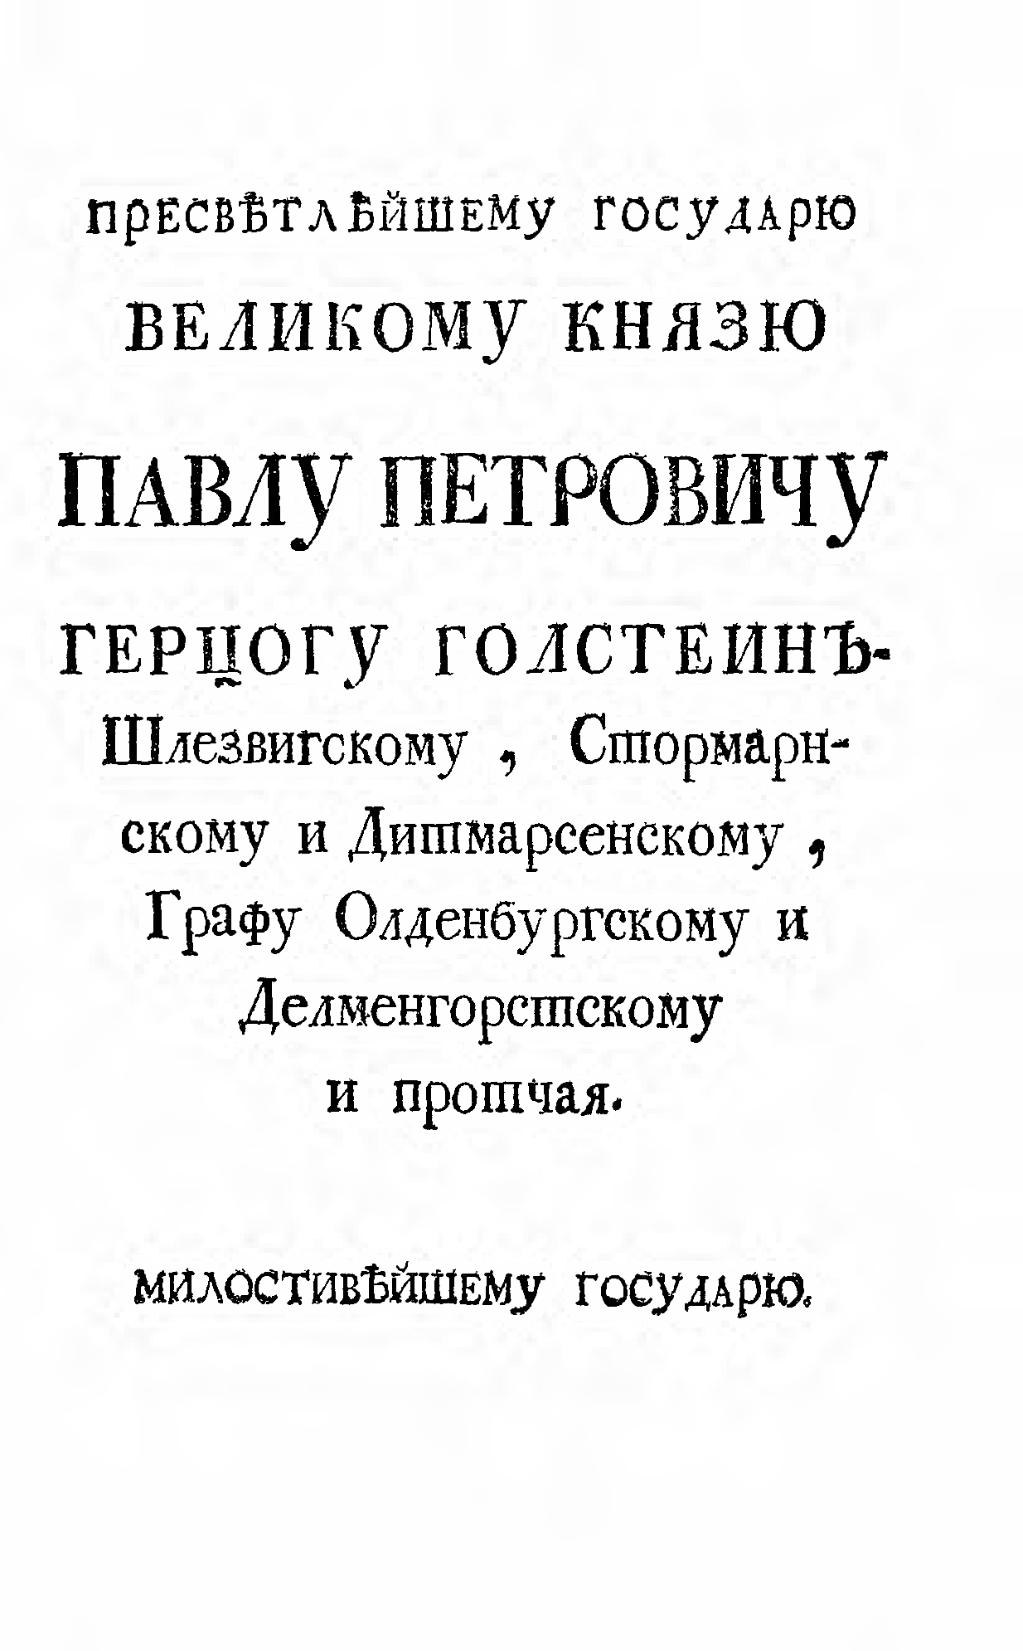 http://images.vfl.ru/ii/1498464371/1da1695c/17714961.jpg